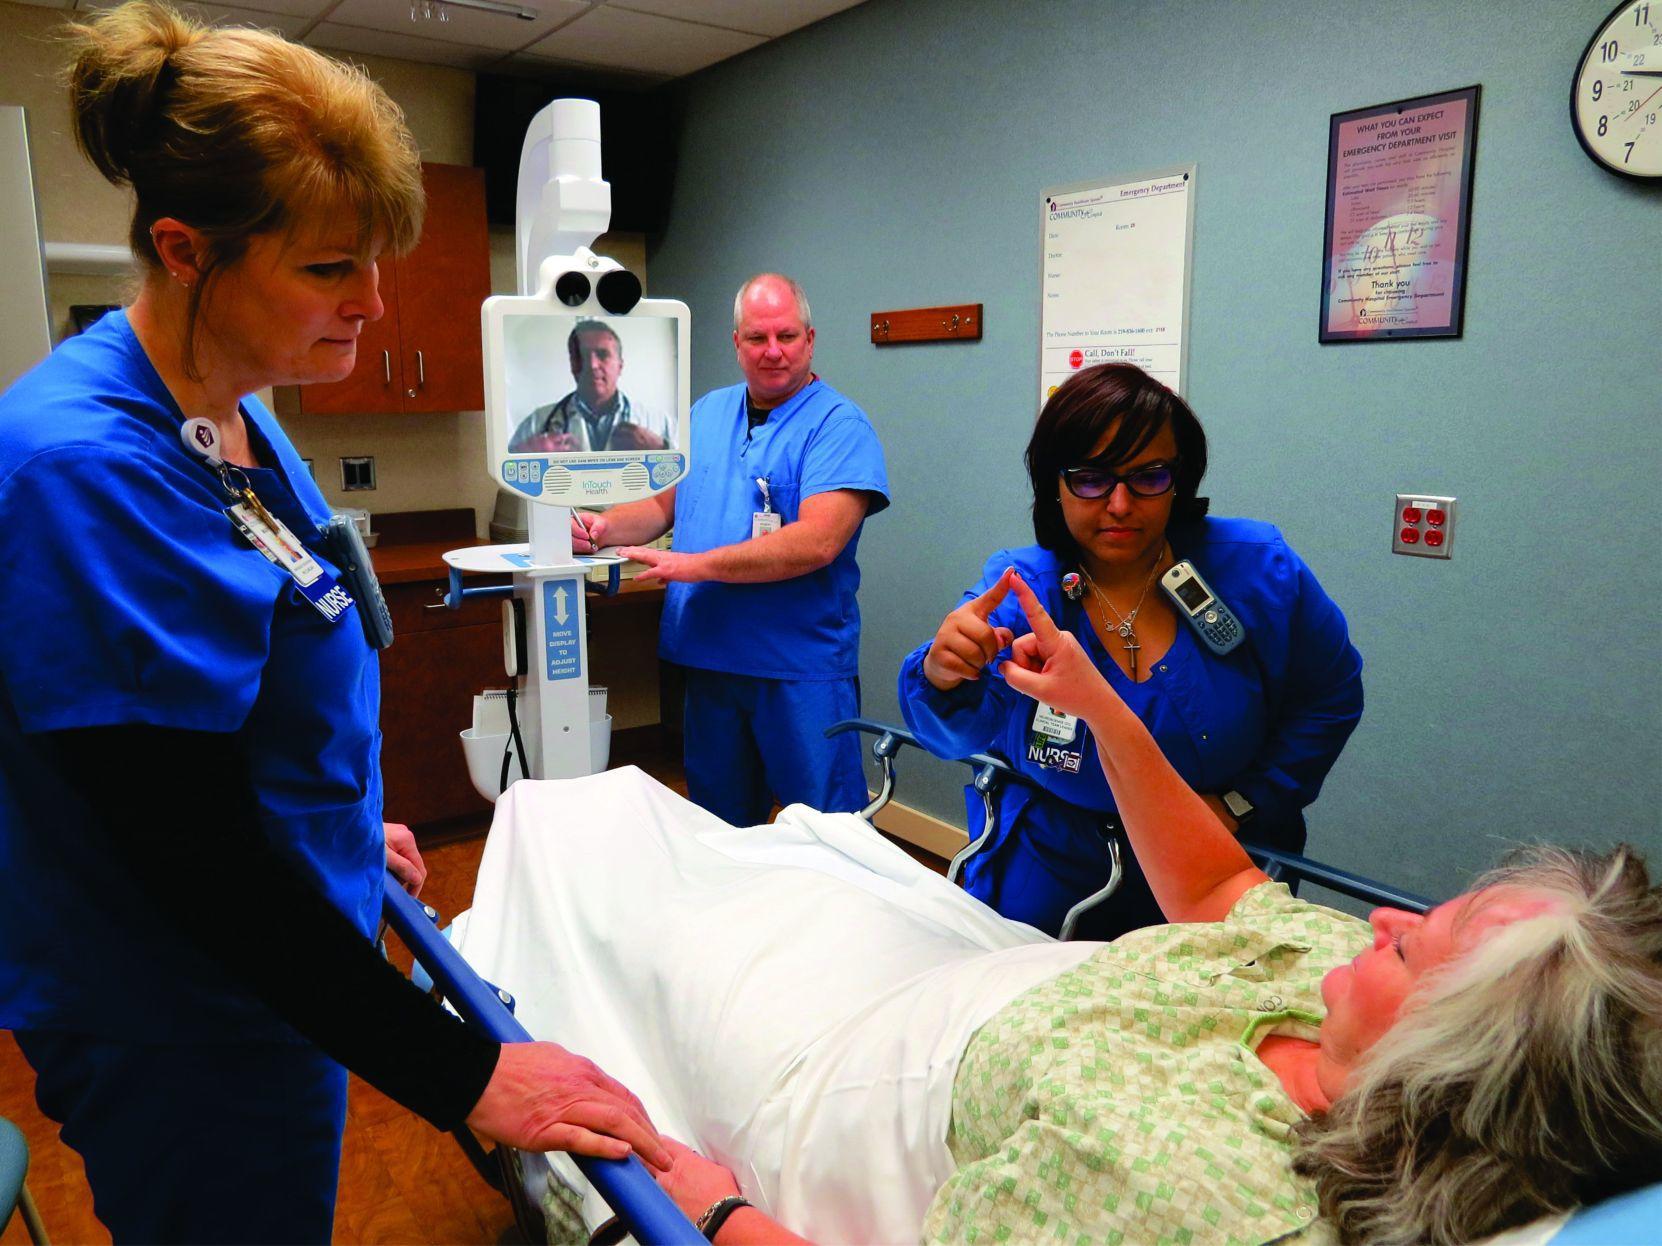 Telestroke 2jpg Health care in NWI thriving